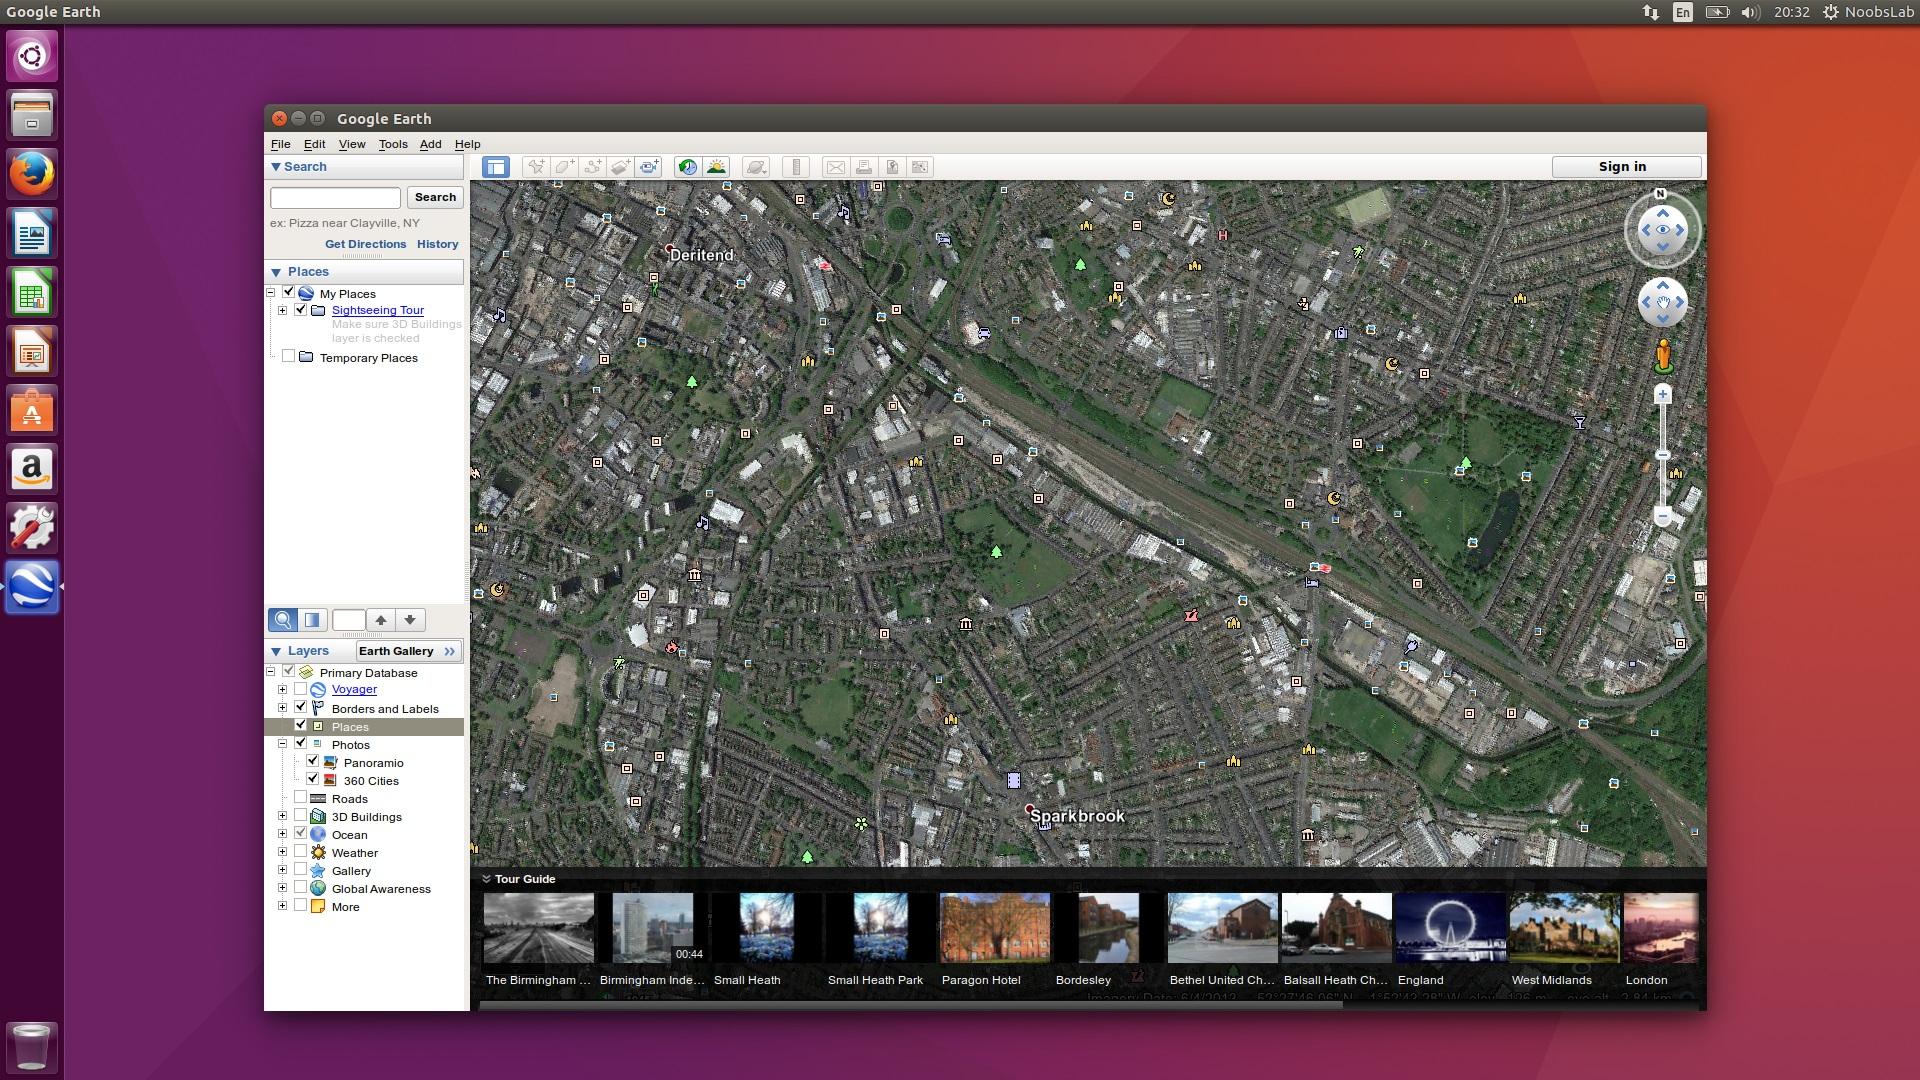 Google themes ubuntu 14.04 - Google Earth